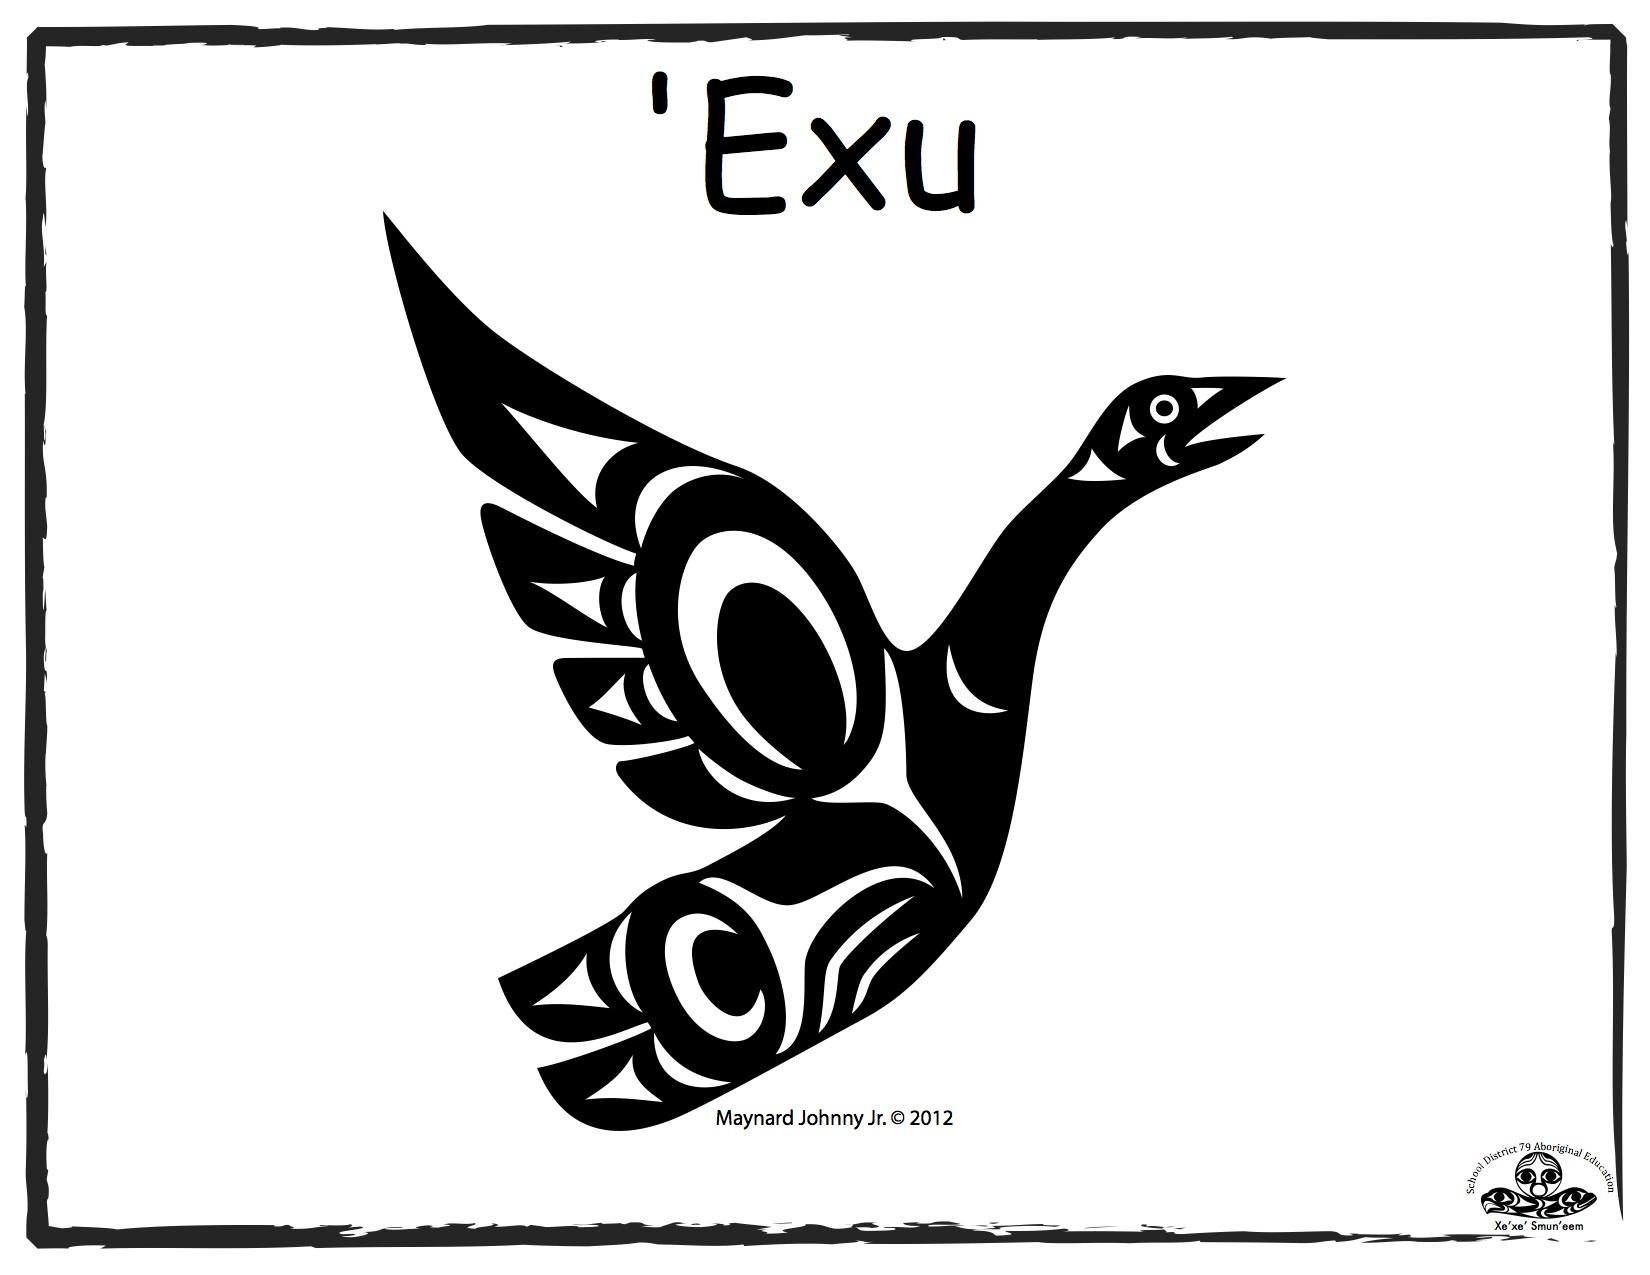 goose-exu